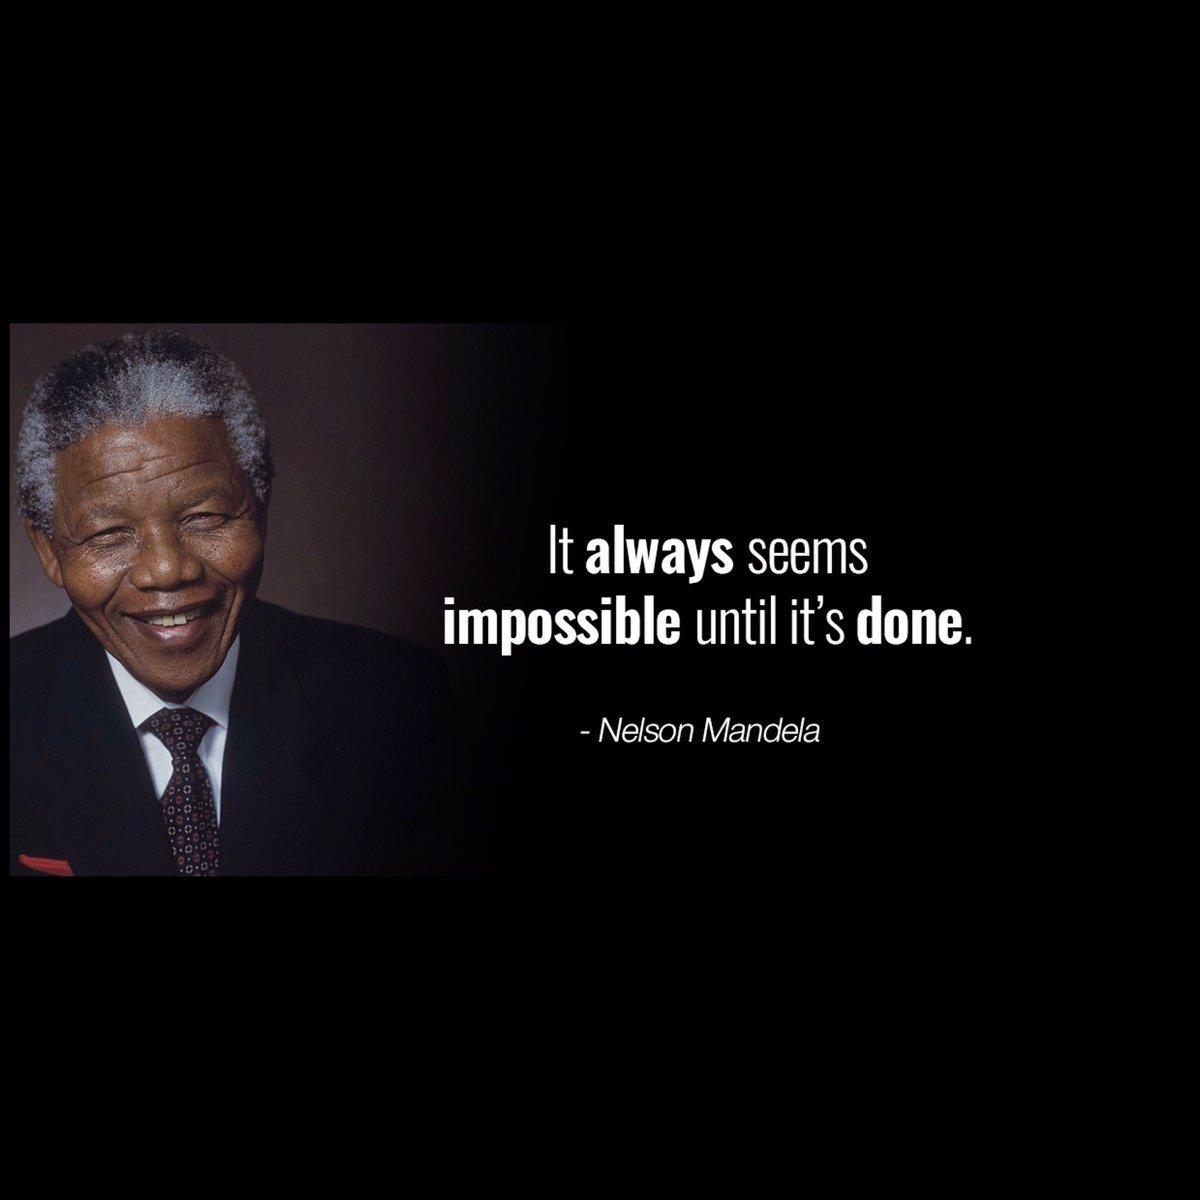 Monday Motivational Message   #NelsonMandela #blackhistory #blackexcellence #Ghana #blackhistorymonth #beyondthereturn #GhanaTourism #GHisthecentre #blackhistorymonth #essencefullcirclefestival #letsgoGhana #africandiaspora #fullcirclefestival   : http://GoalCast.compic.twitter.com/pnXHkF81fL